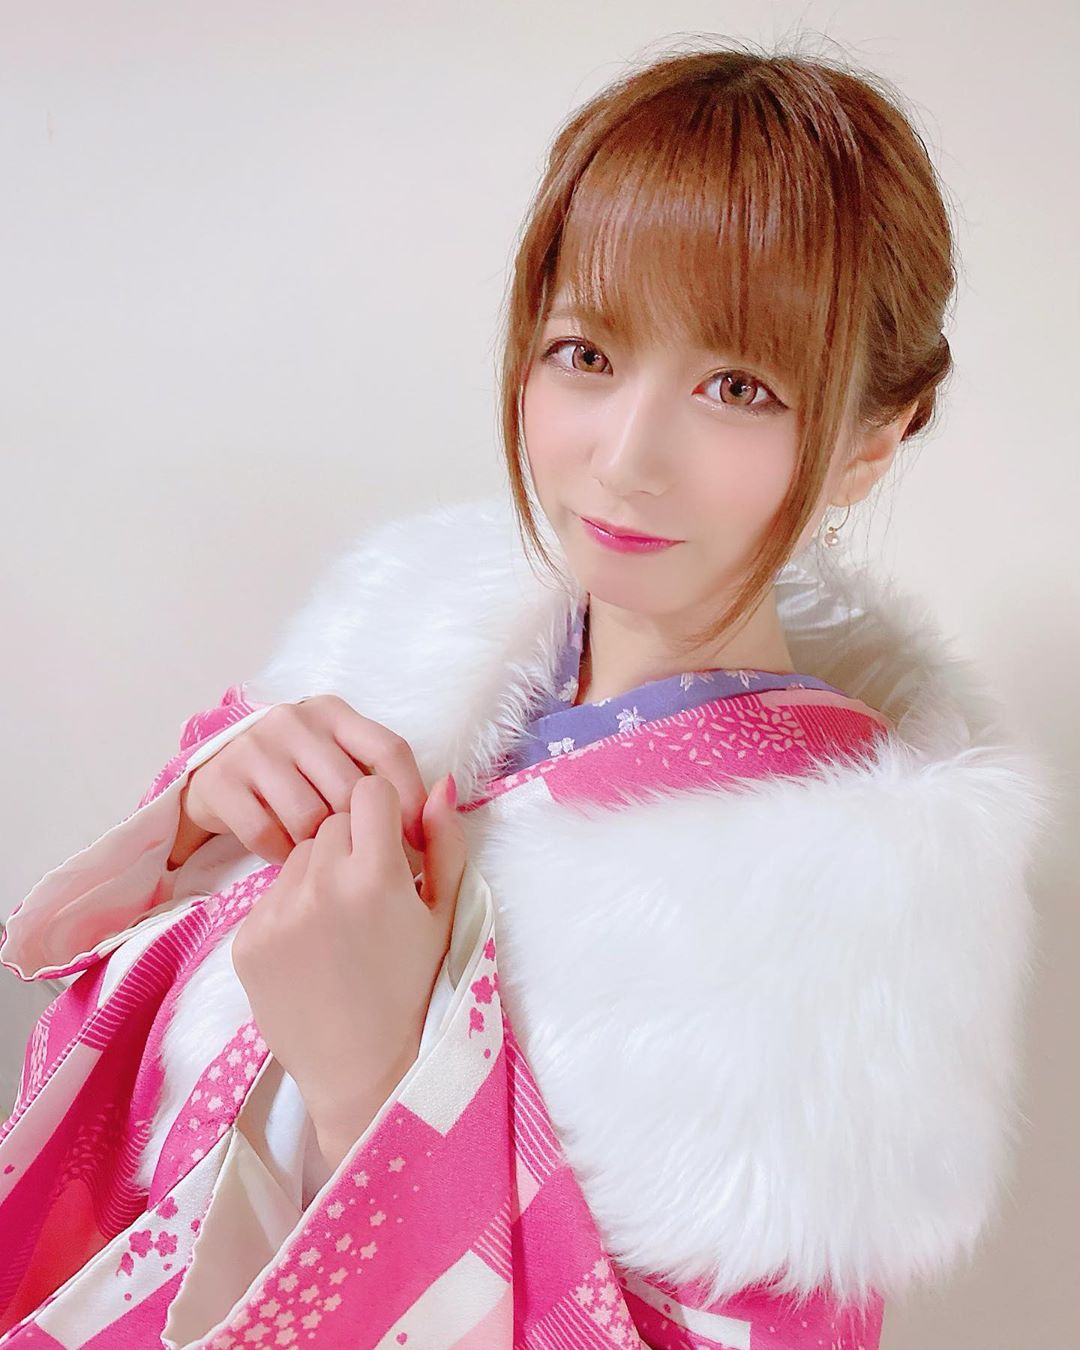 pdpi0OzQ o - IG正妹—桜りん